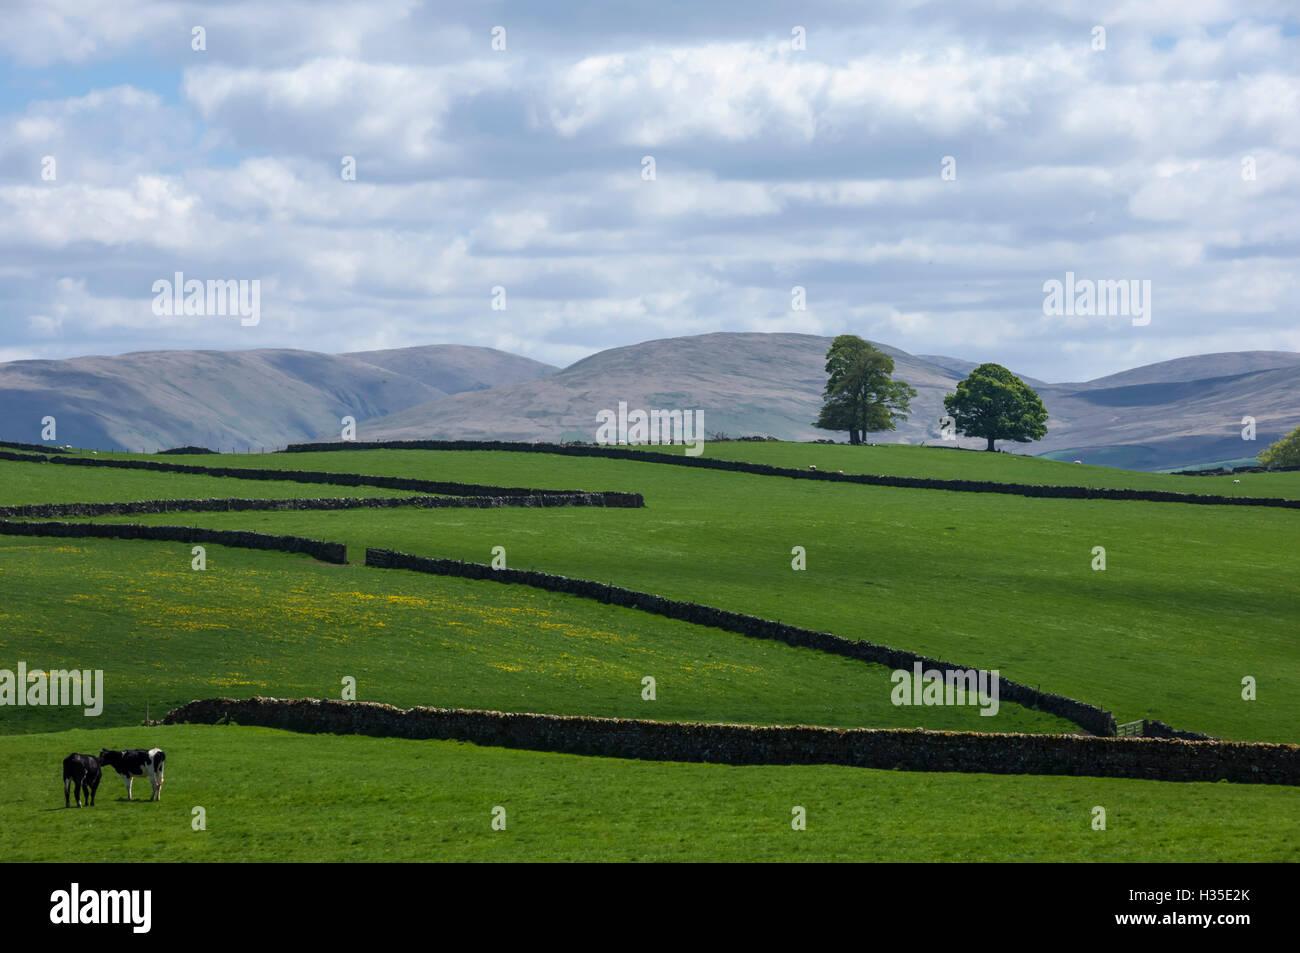 Dry stone walls, Eden Valley, Cumbria, England, UK - Stock Image